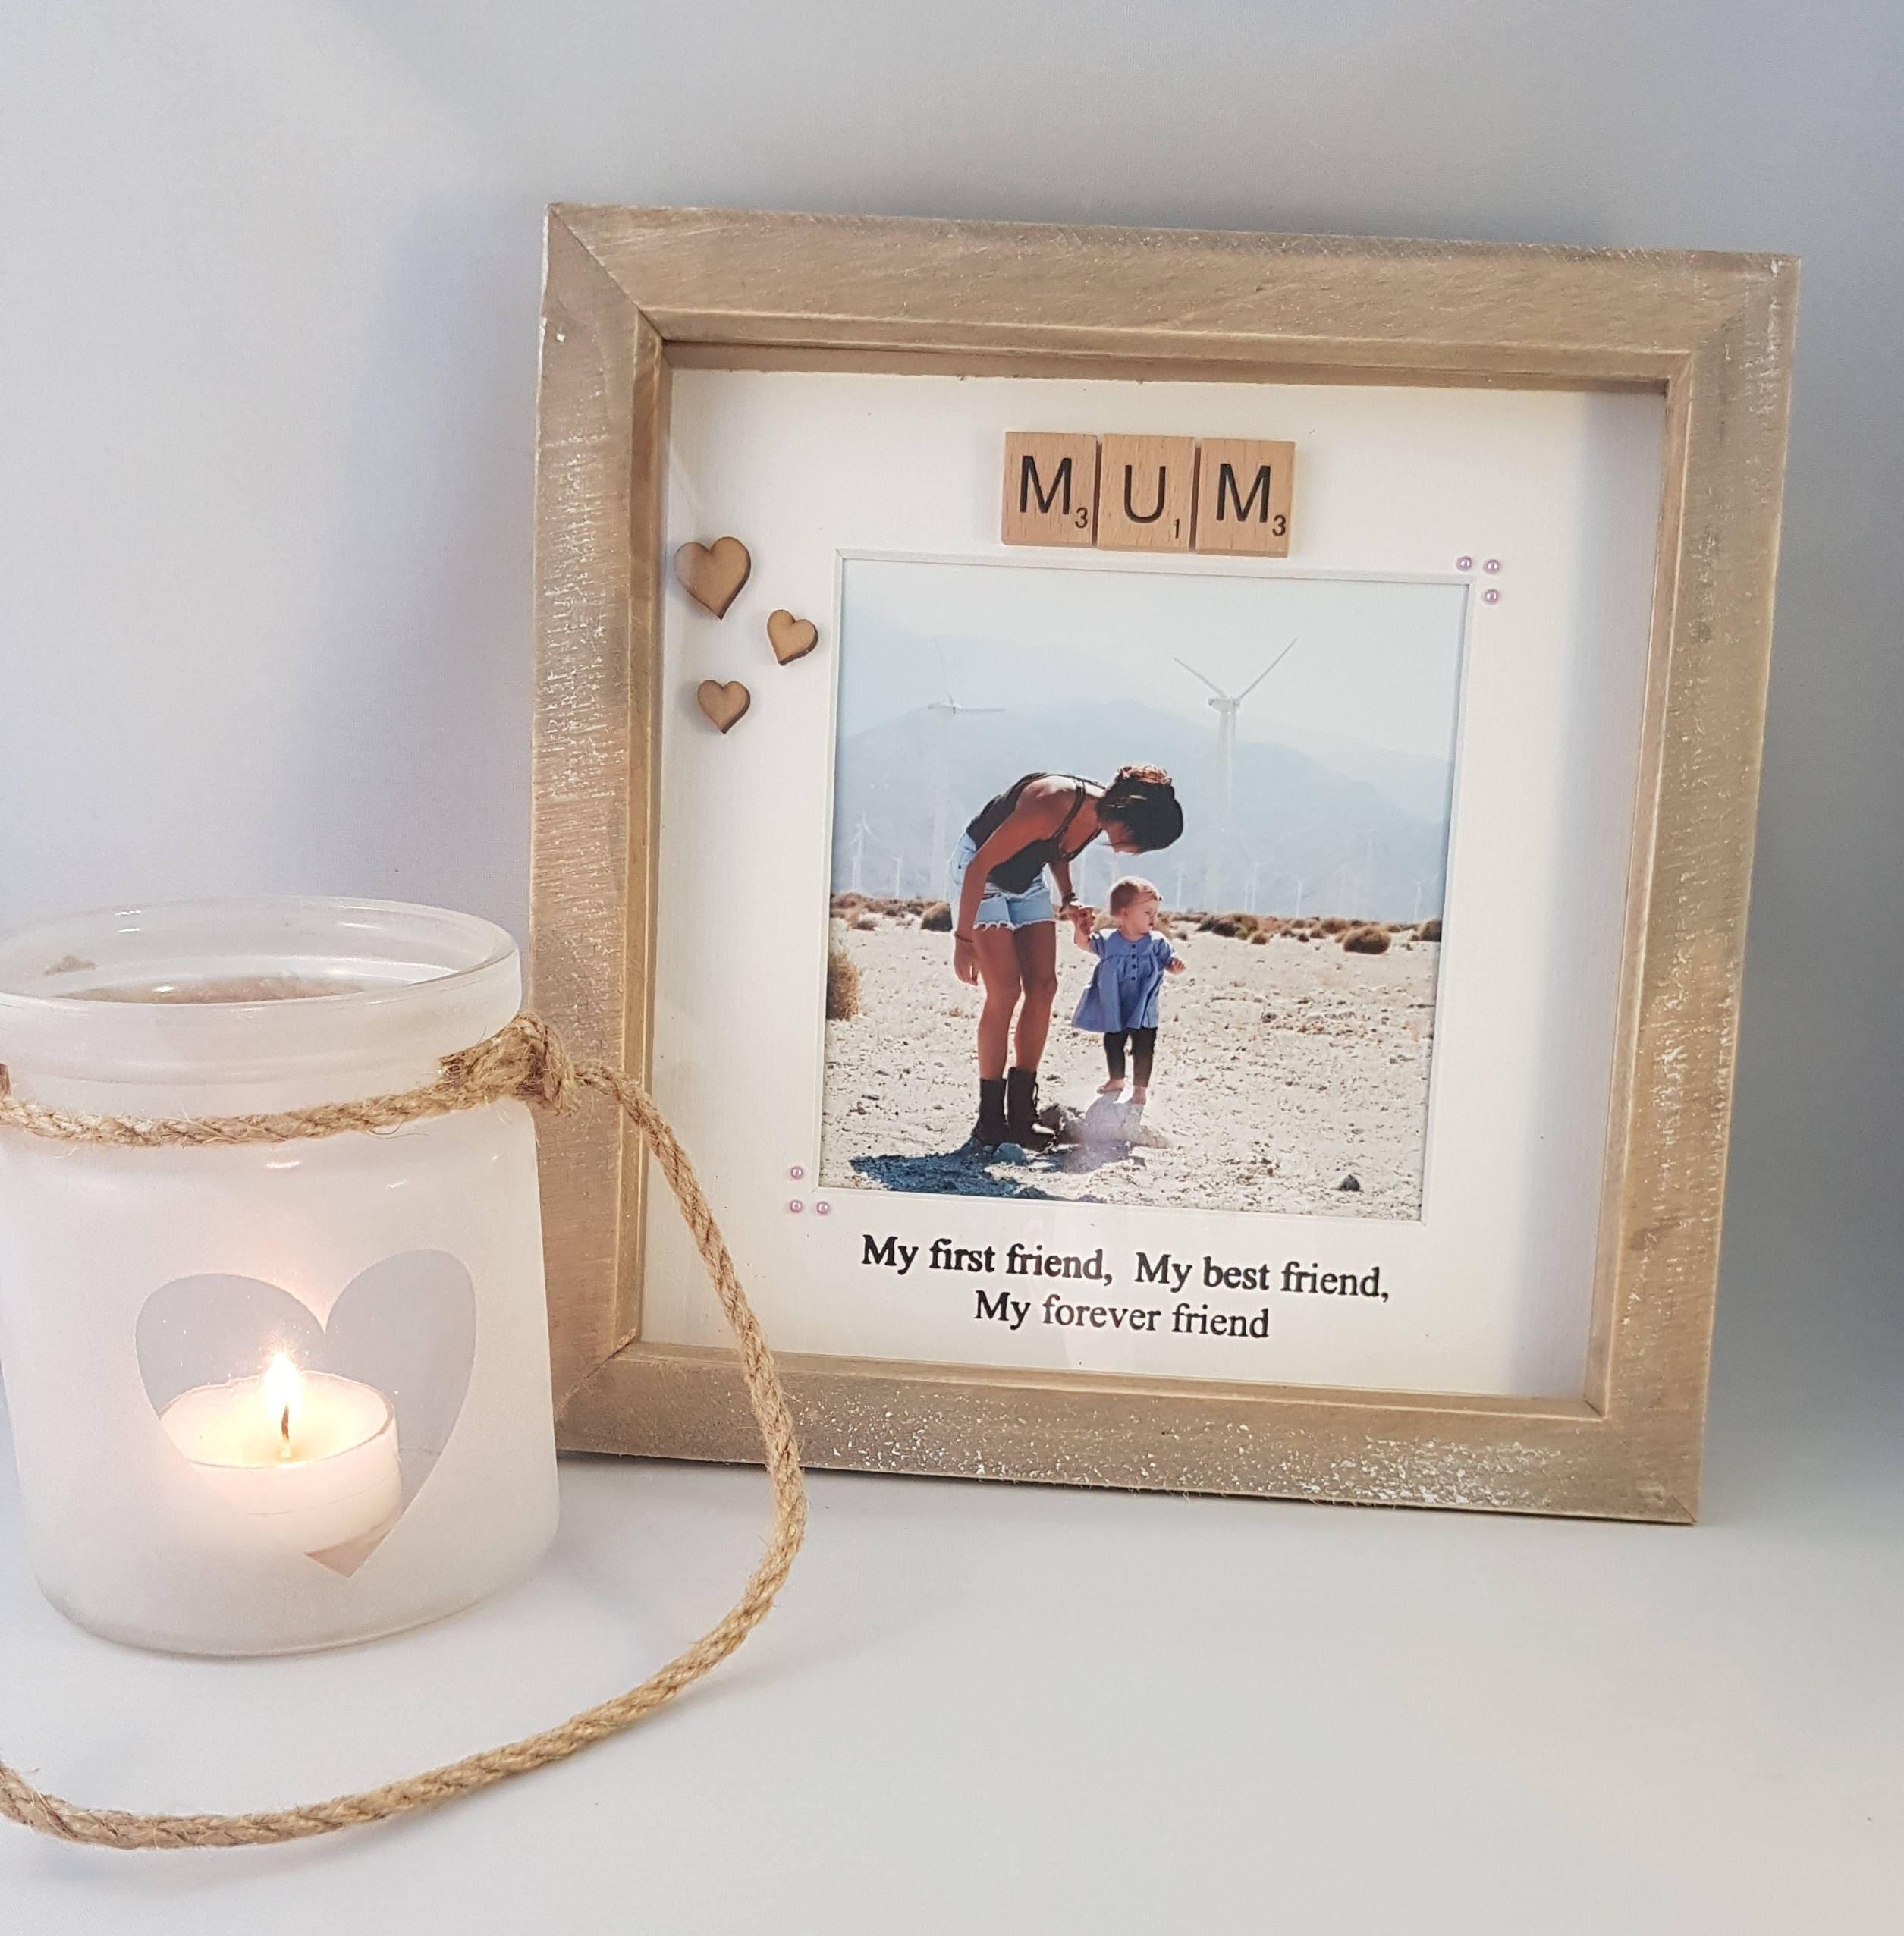 Mum Photo Frame Mummy Photo Frame Gift for Mum Special Mum